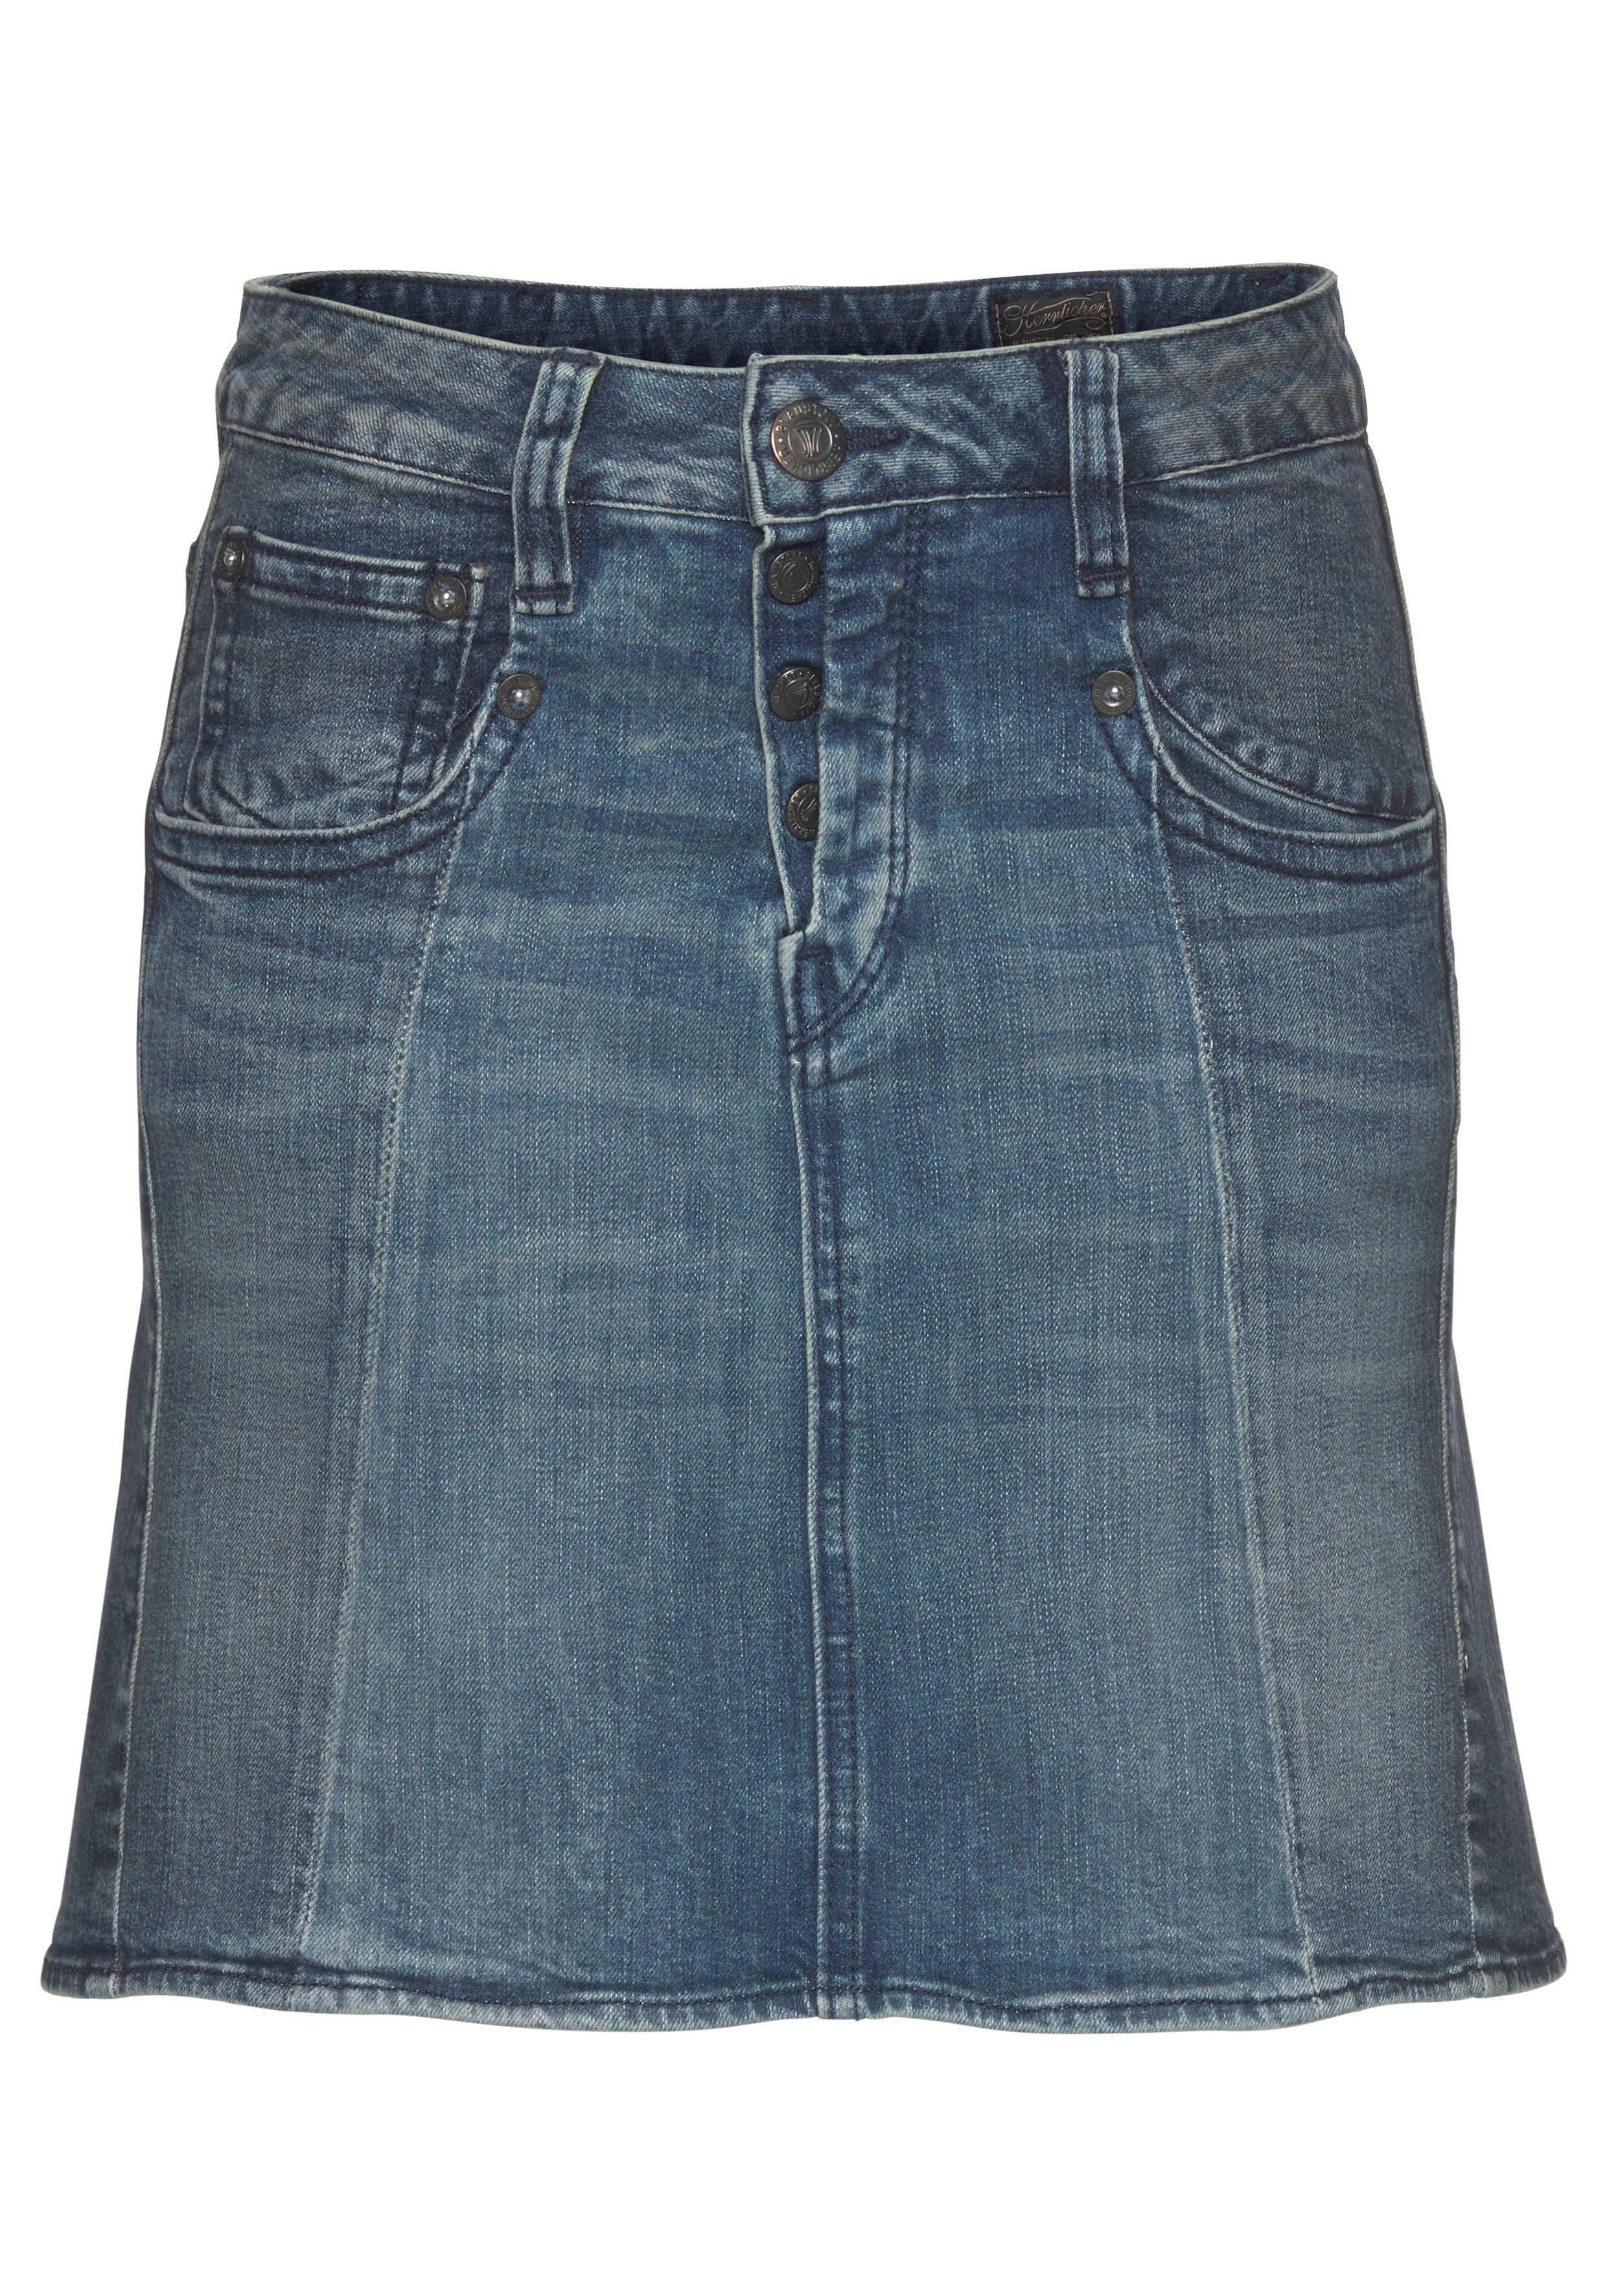 Herrlicher jeansrok »SHYRA SKIRT« nu online kopen bij OTTO